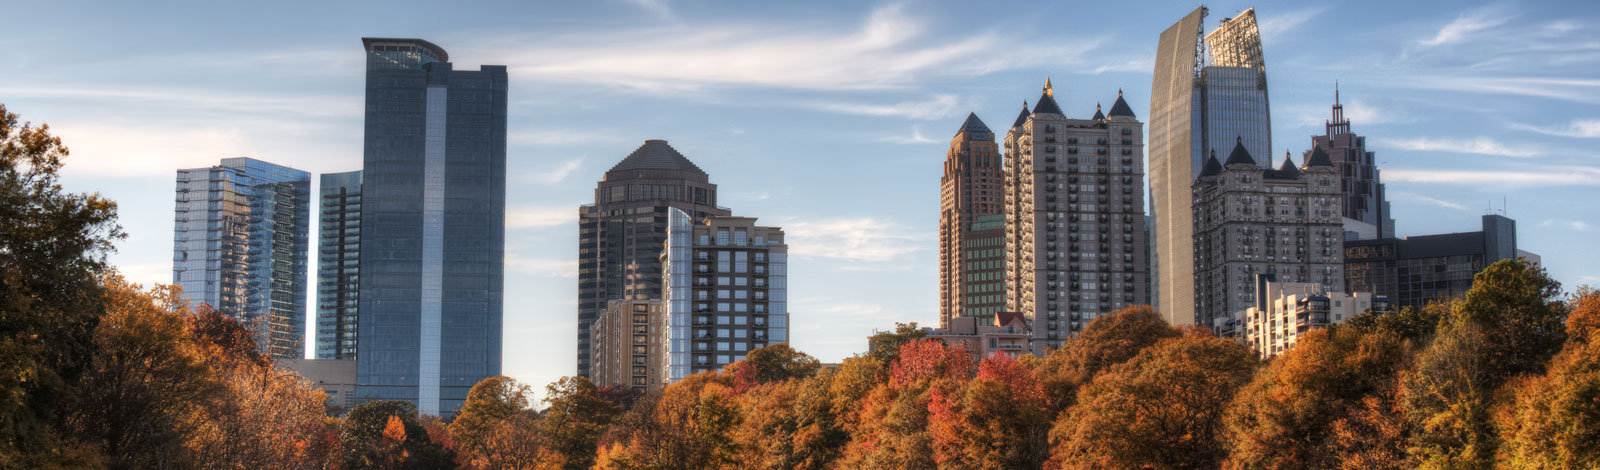 Downtown Atlanta Skyline photo